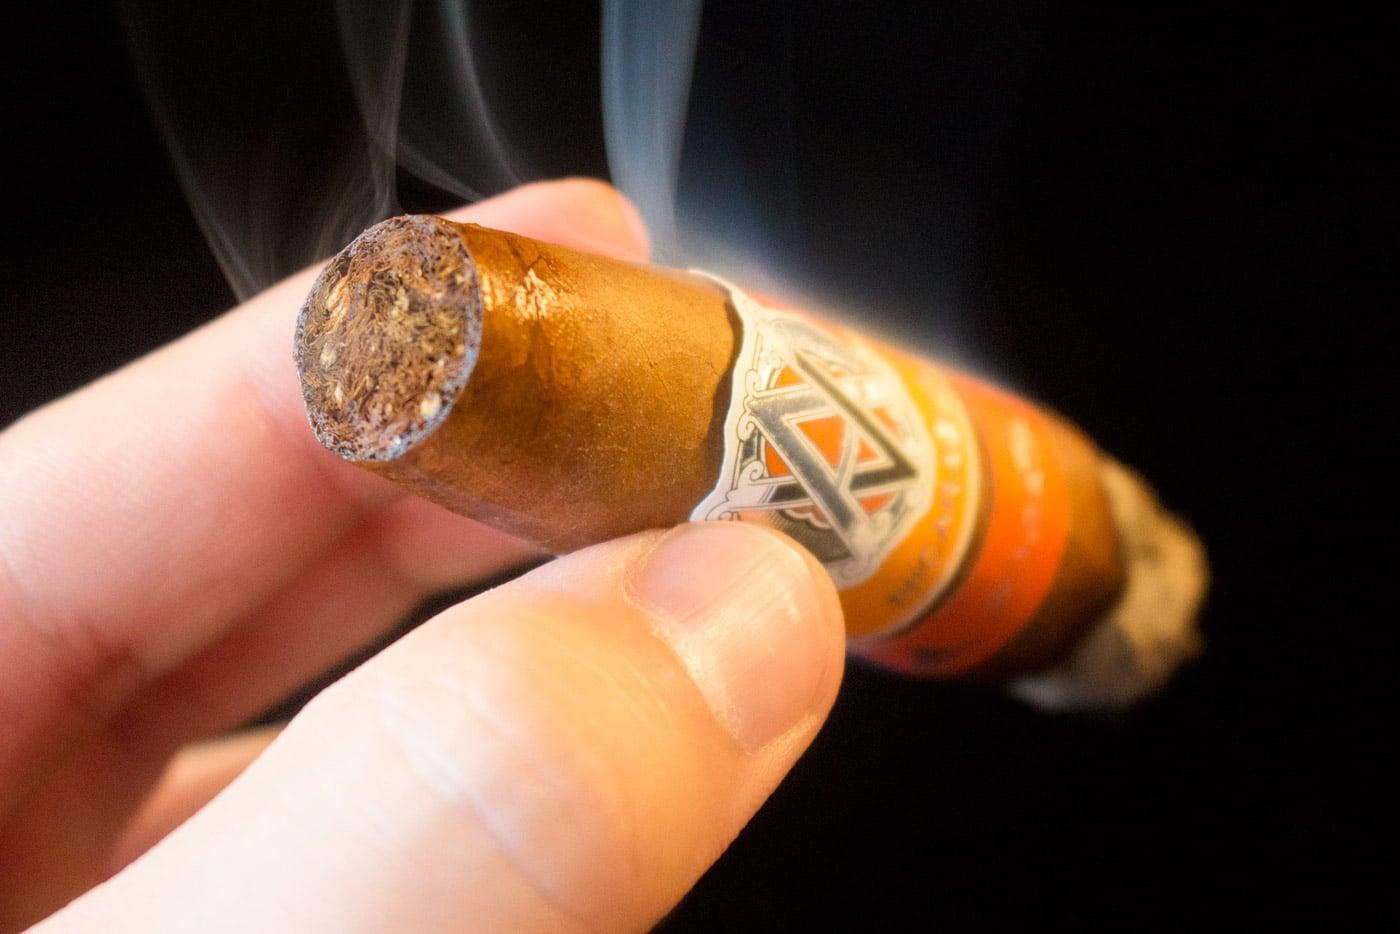 AVO Syncro Nicaragua Fogata Short Torpedo cigar review